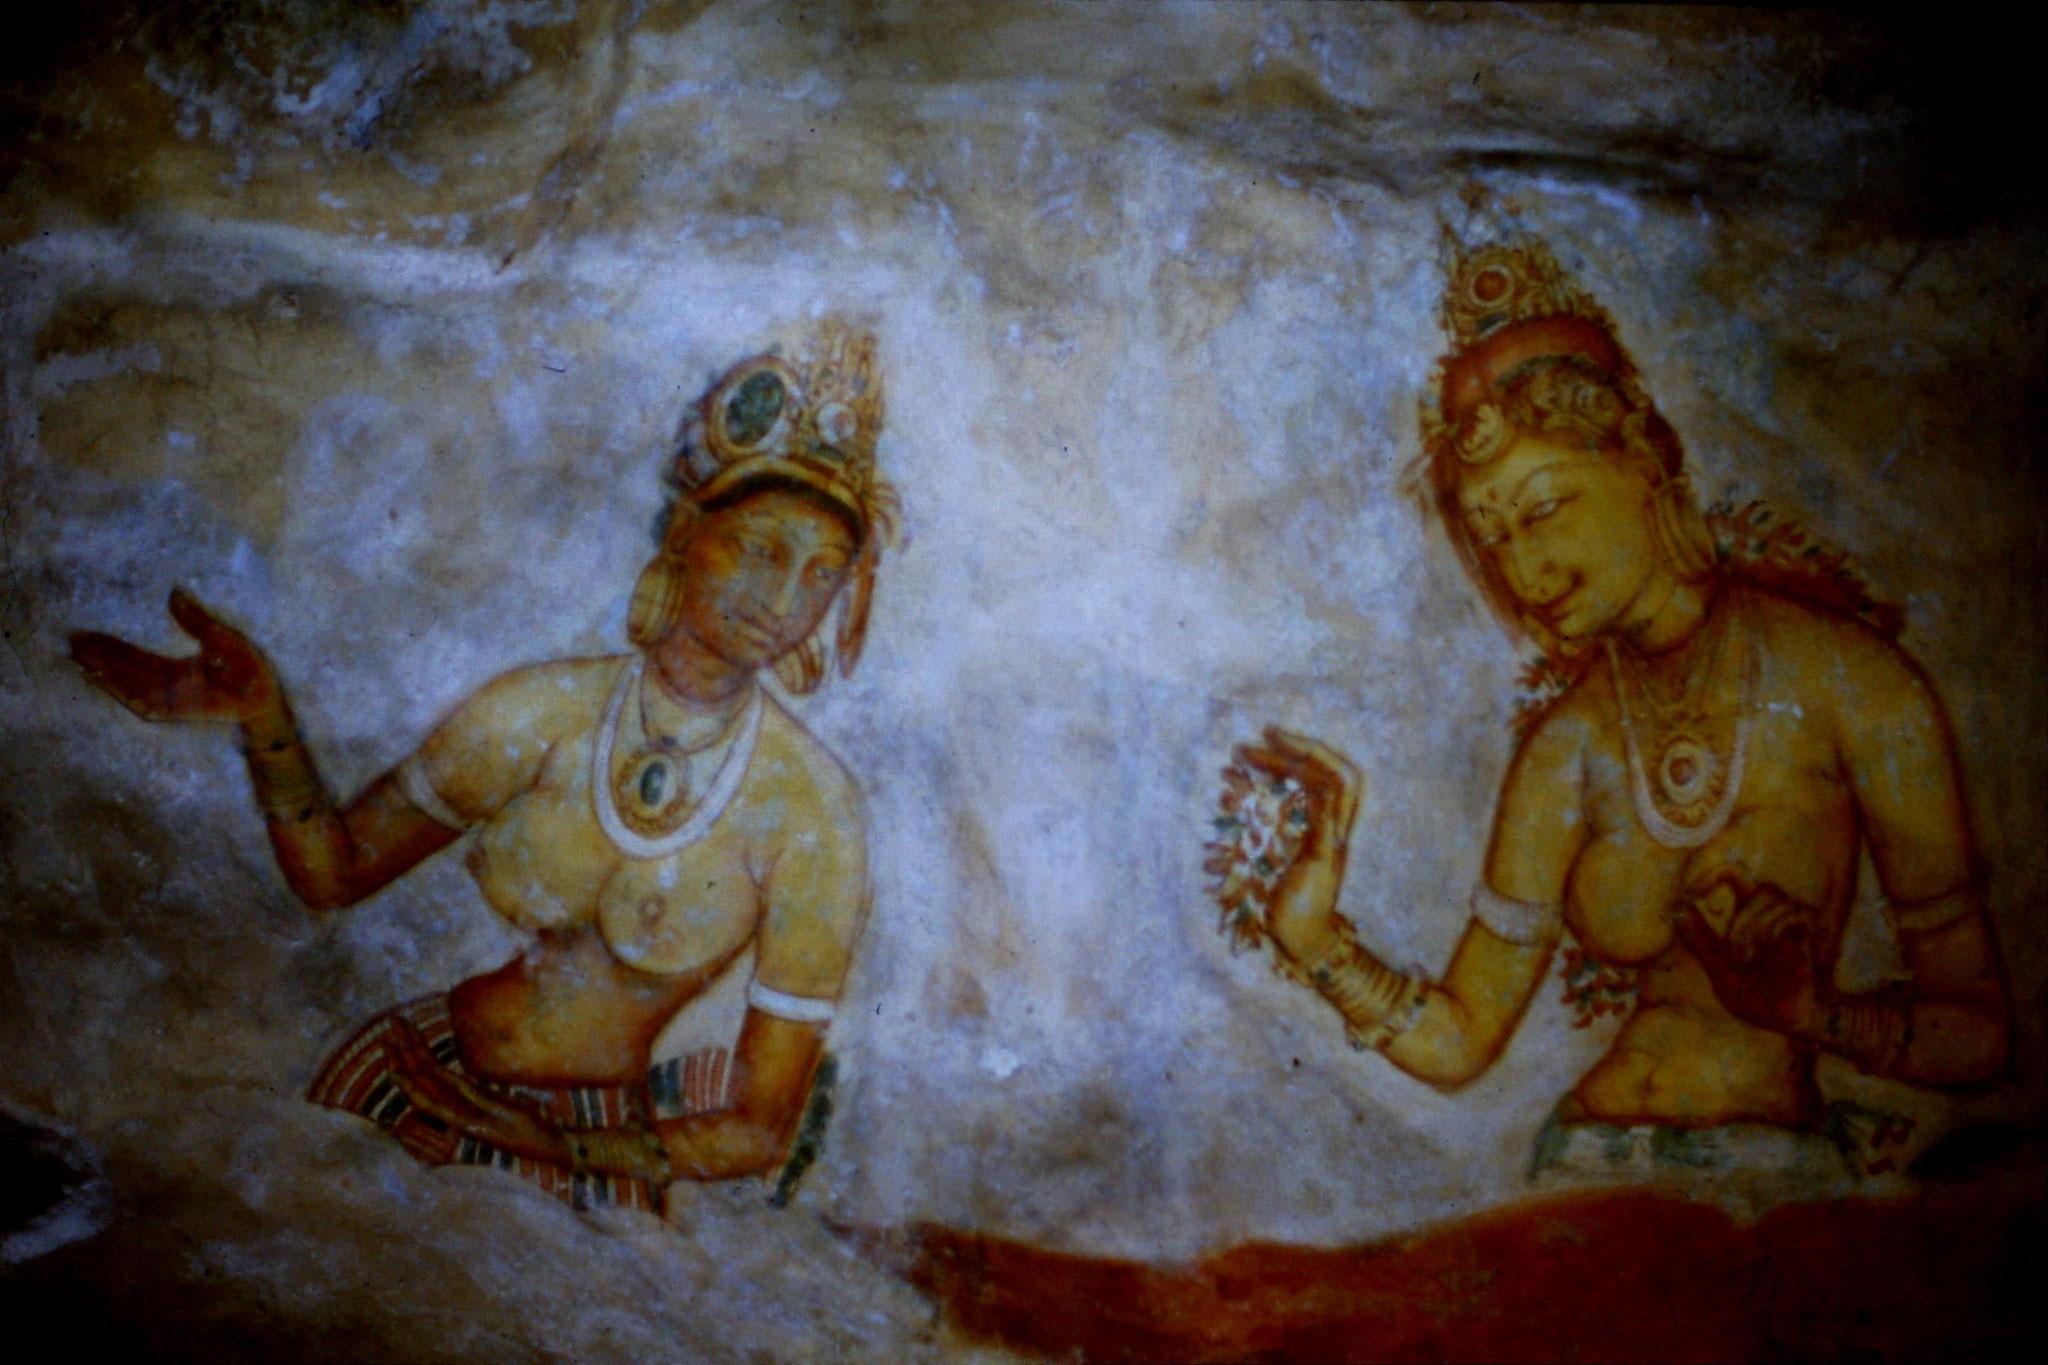 7/2/1990: 29: Sigiriya fresco